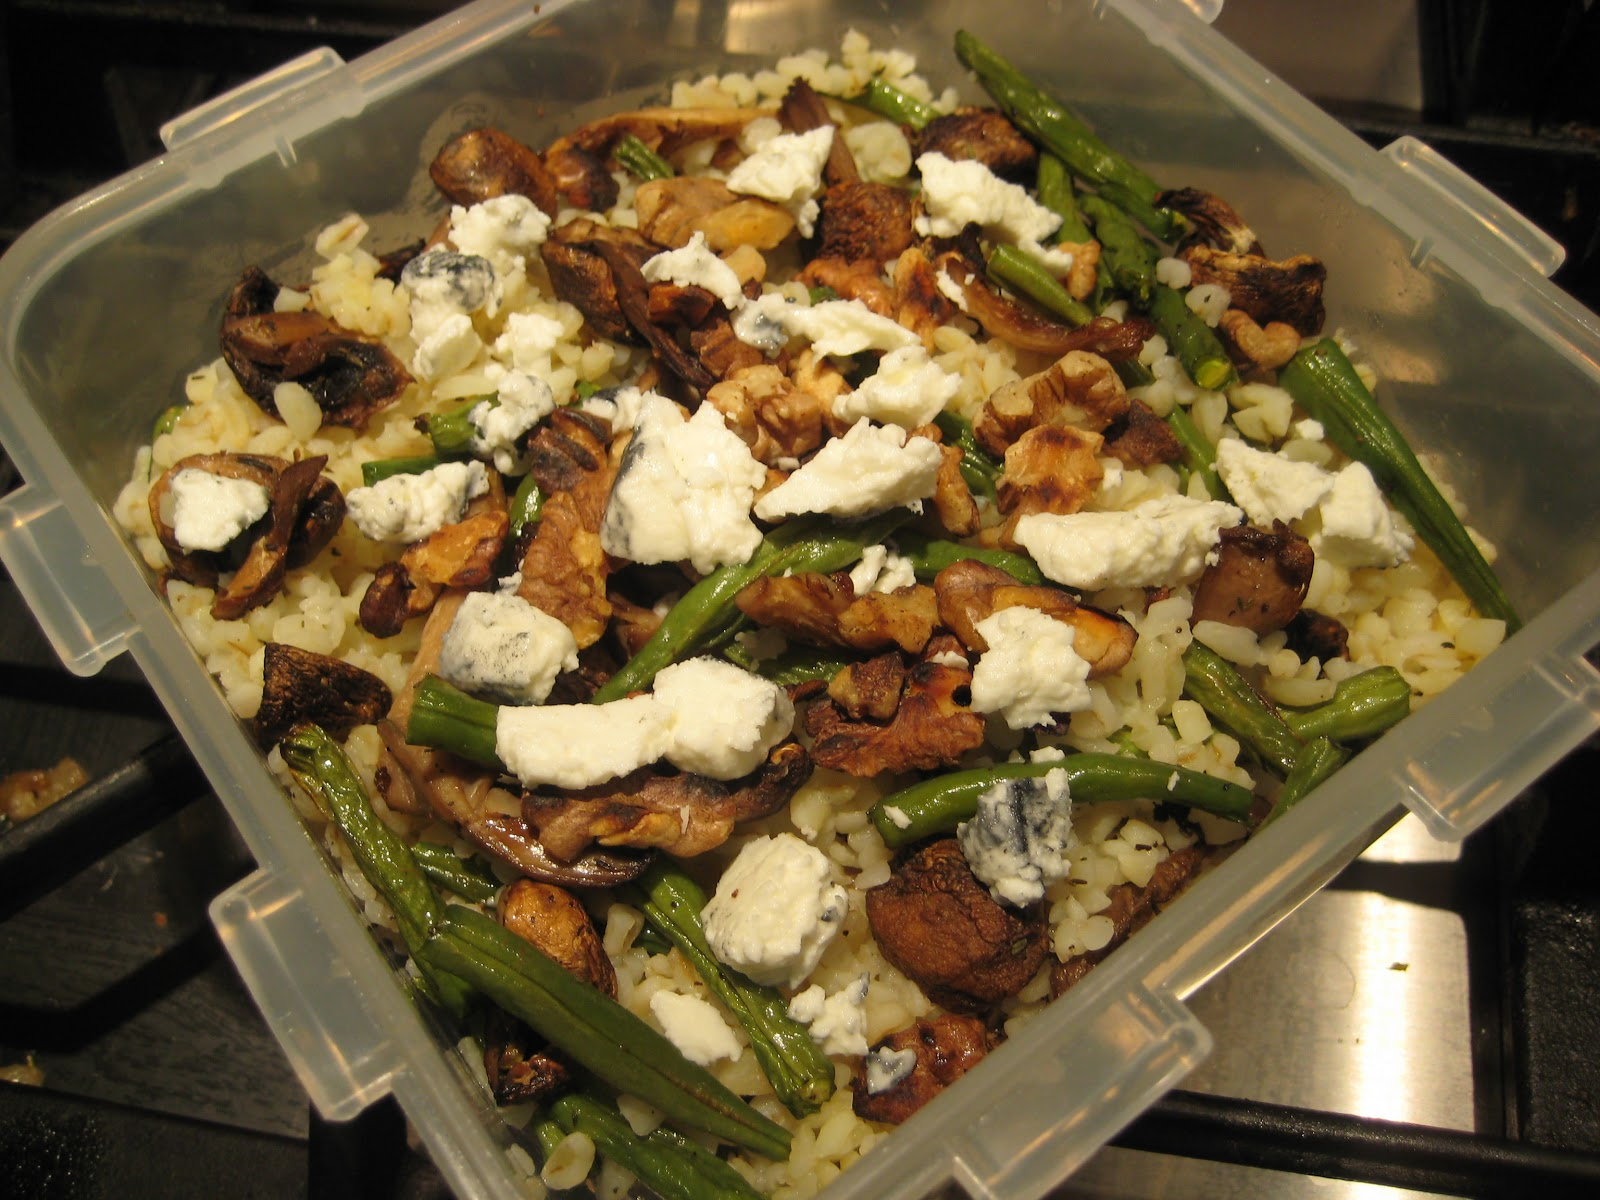 Lemon and Cheese: Roasted Mushroom and Green Bean Bulgar Wheat Salad